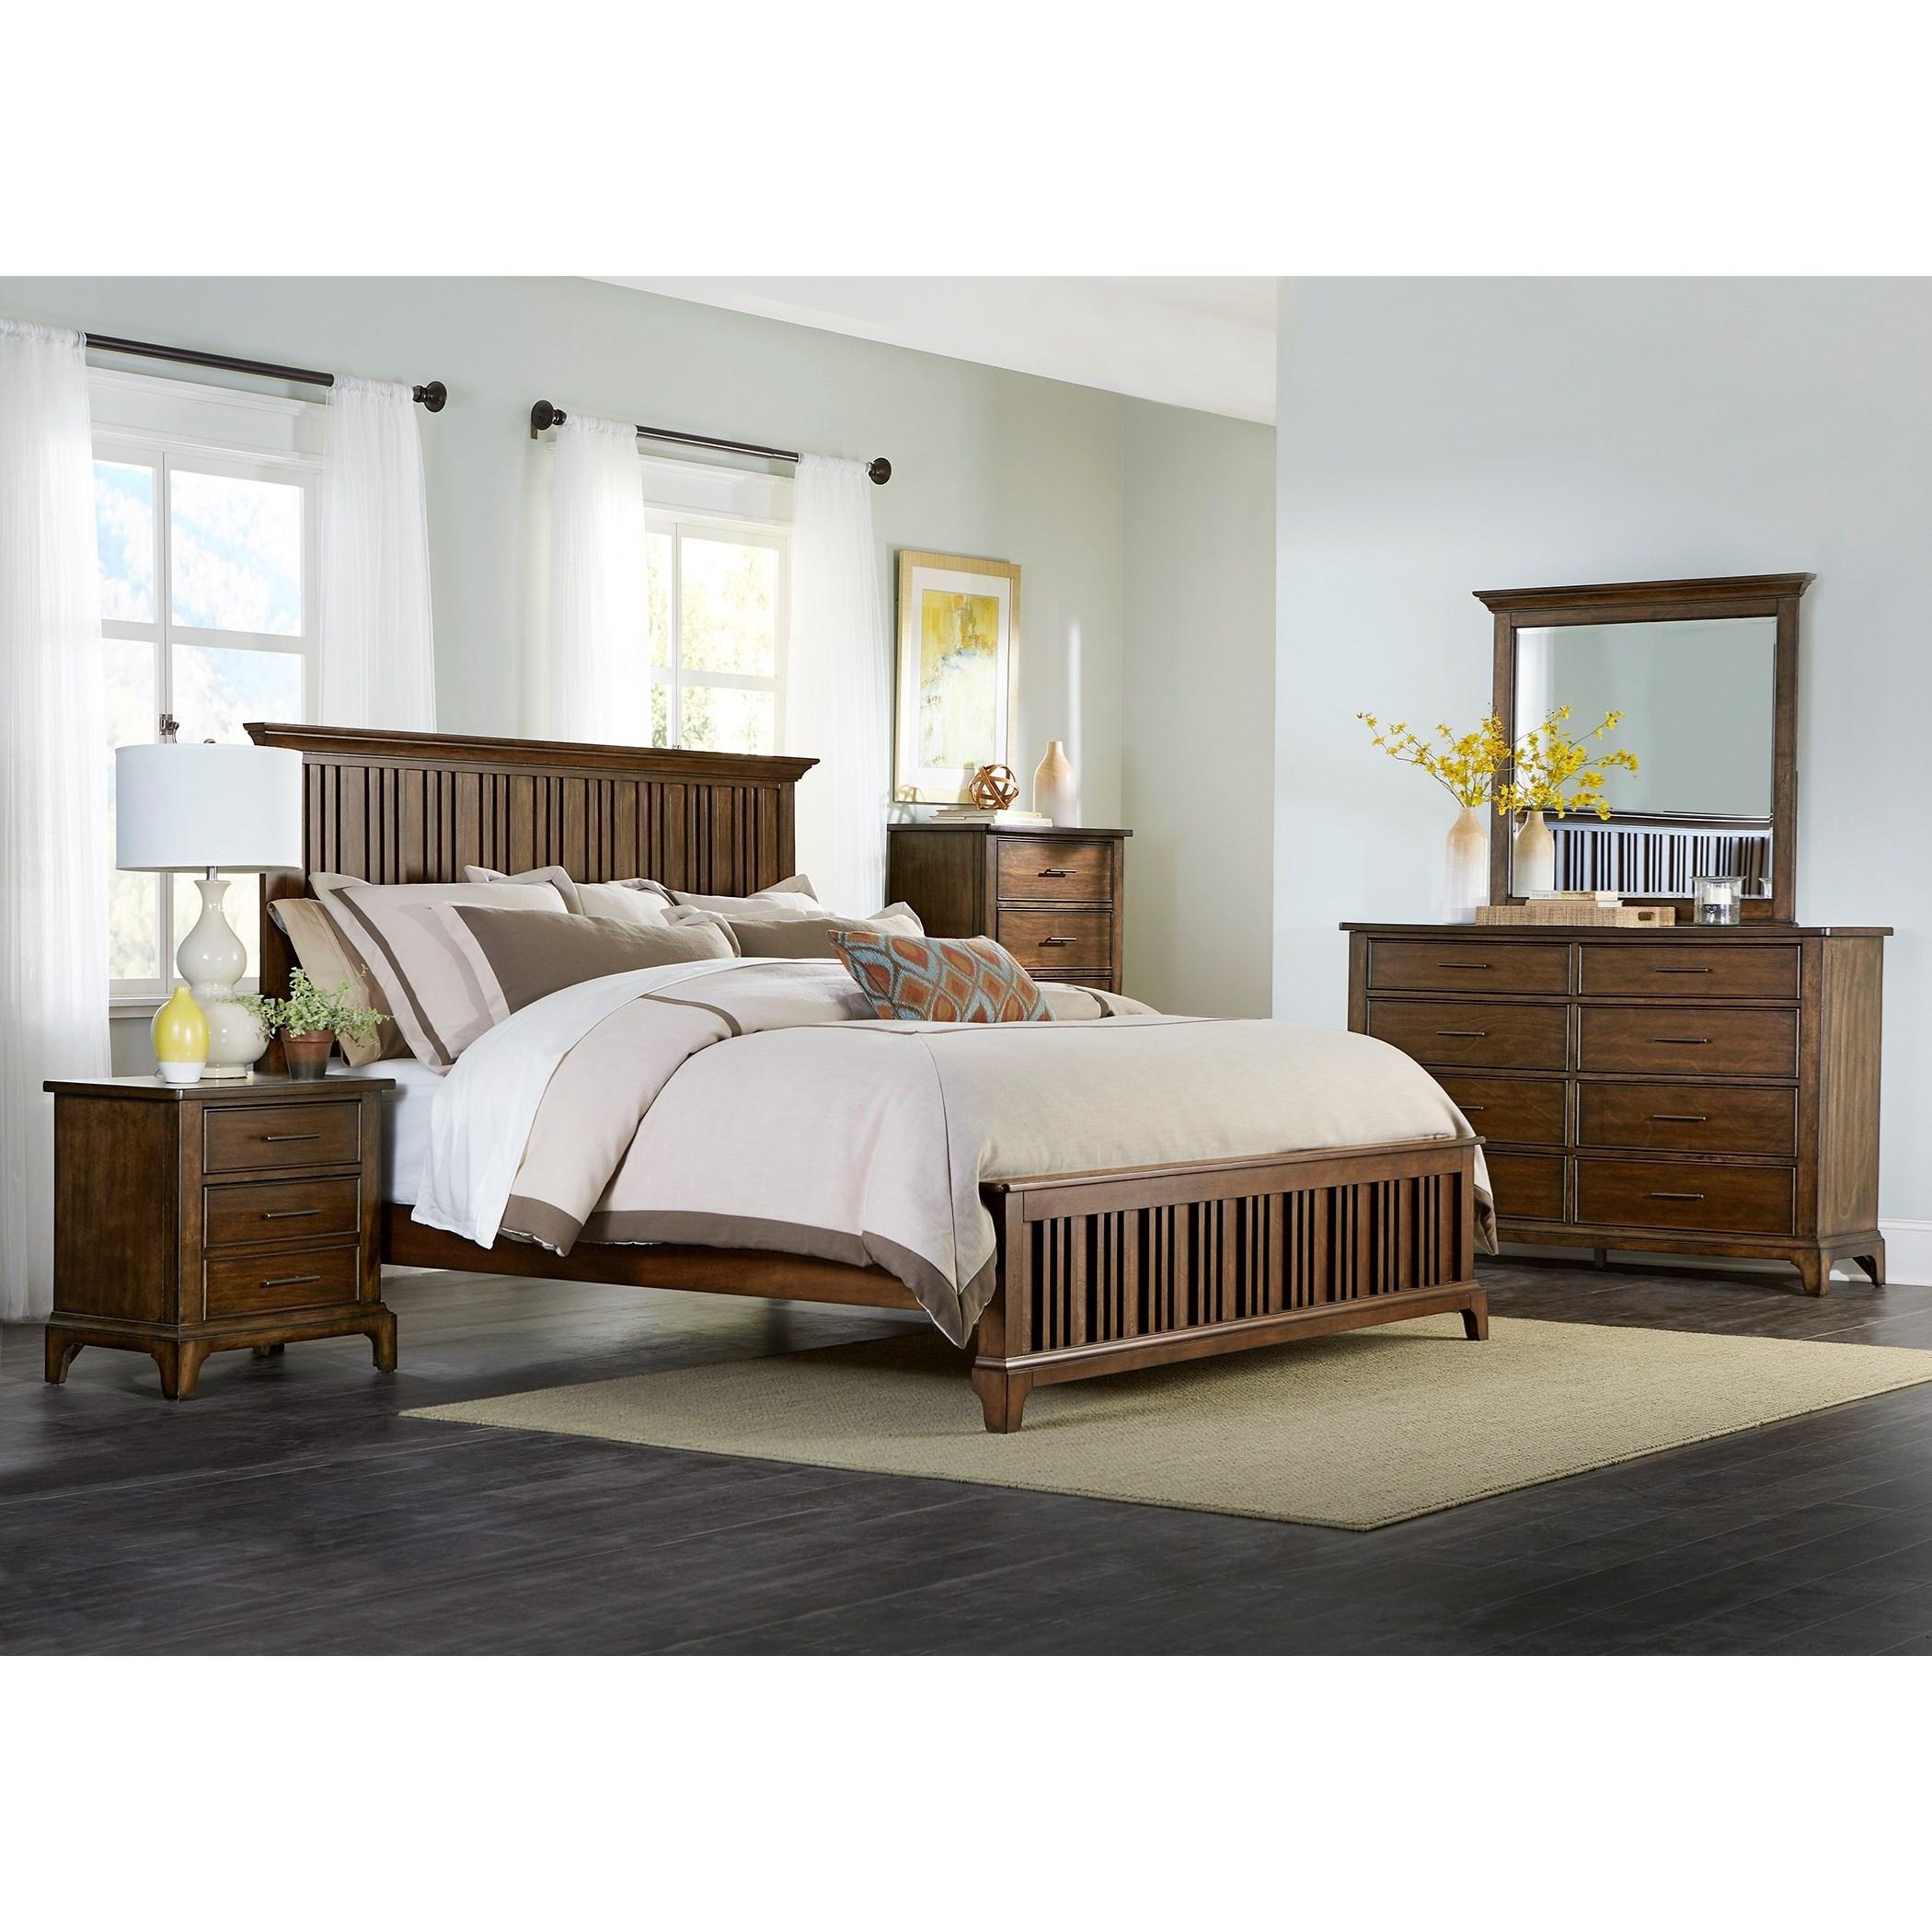 Liberty Furniture Mill Creek 458 458 Br Qpb Queen Panel